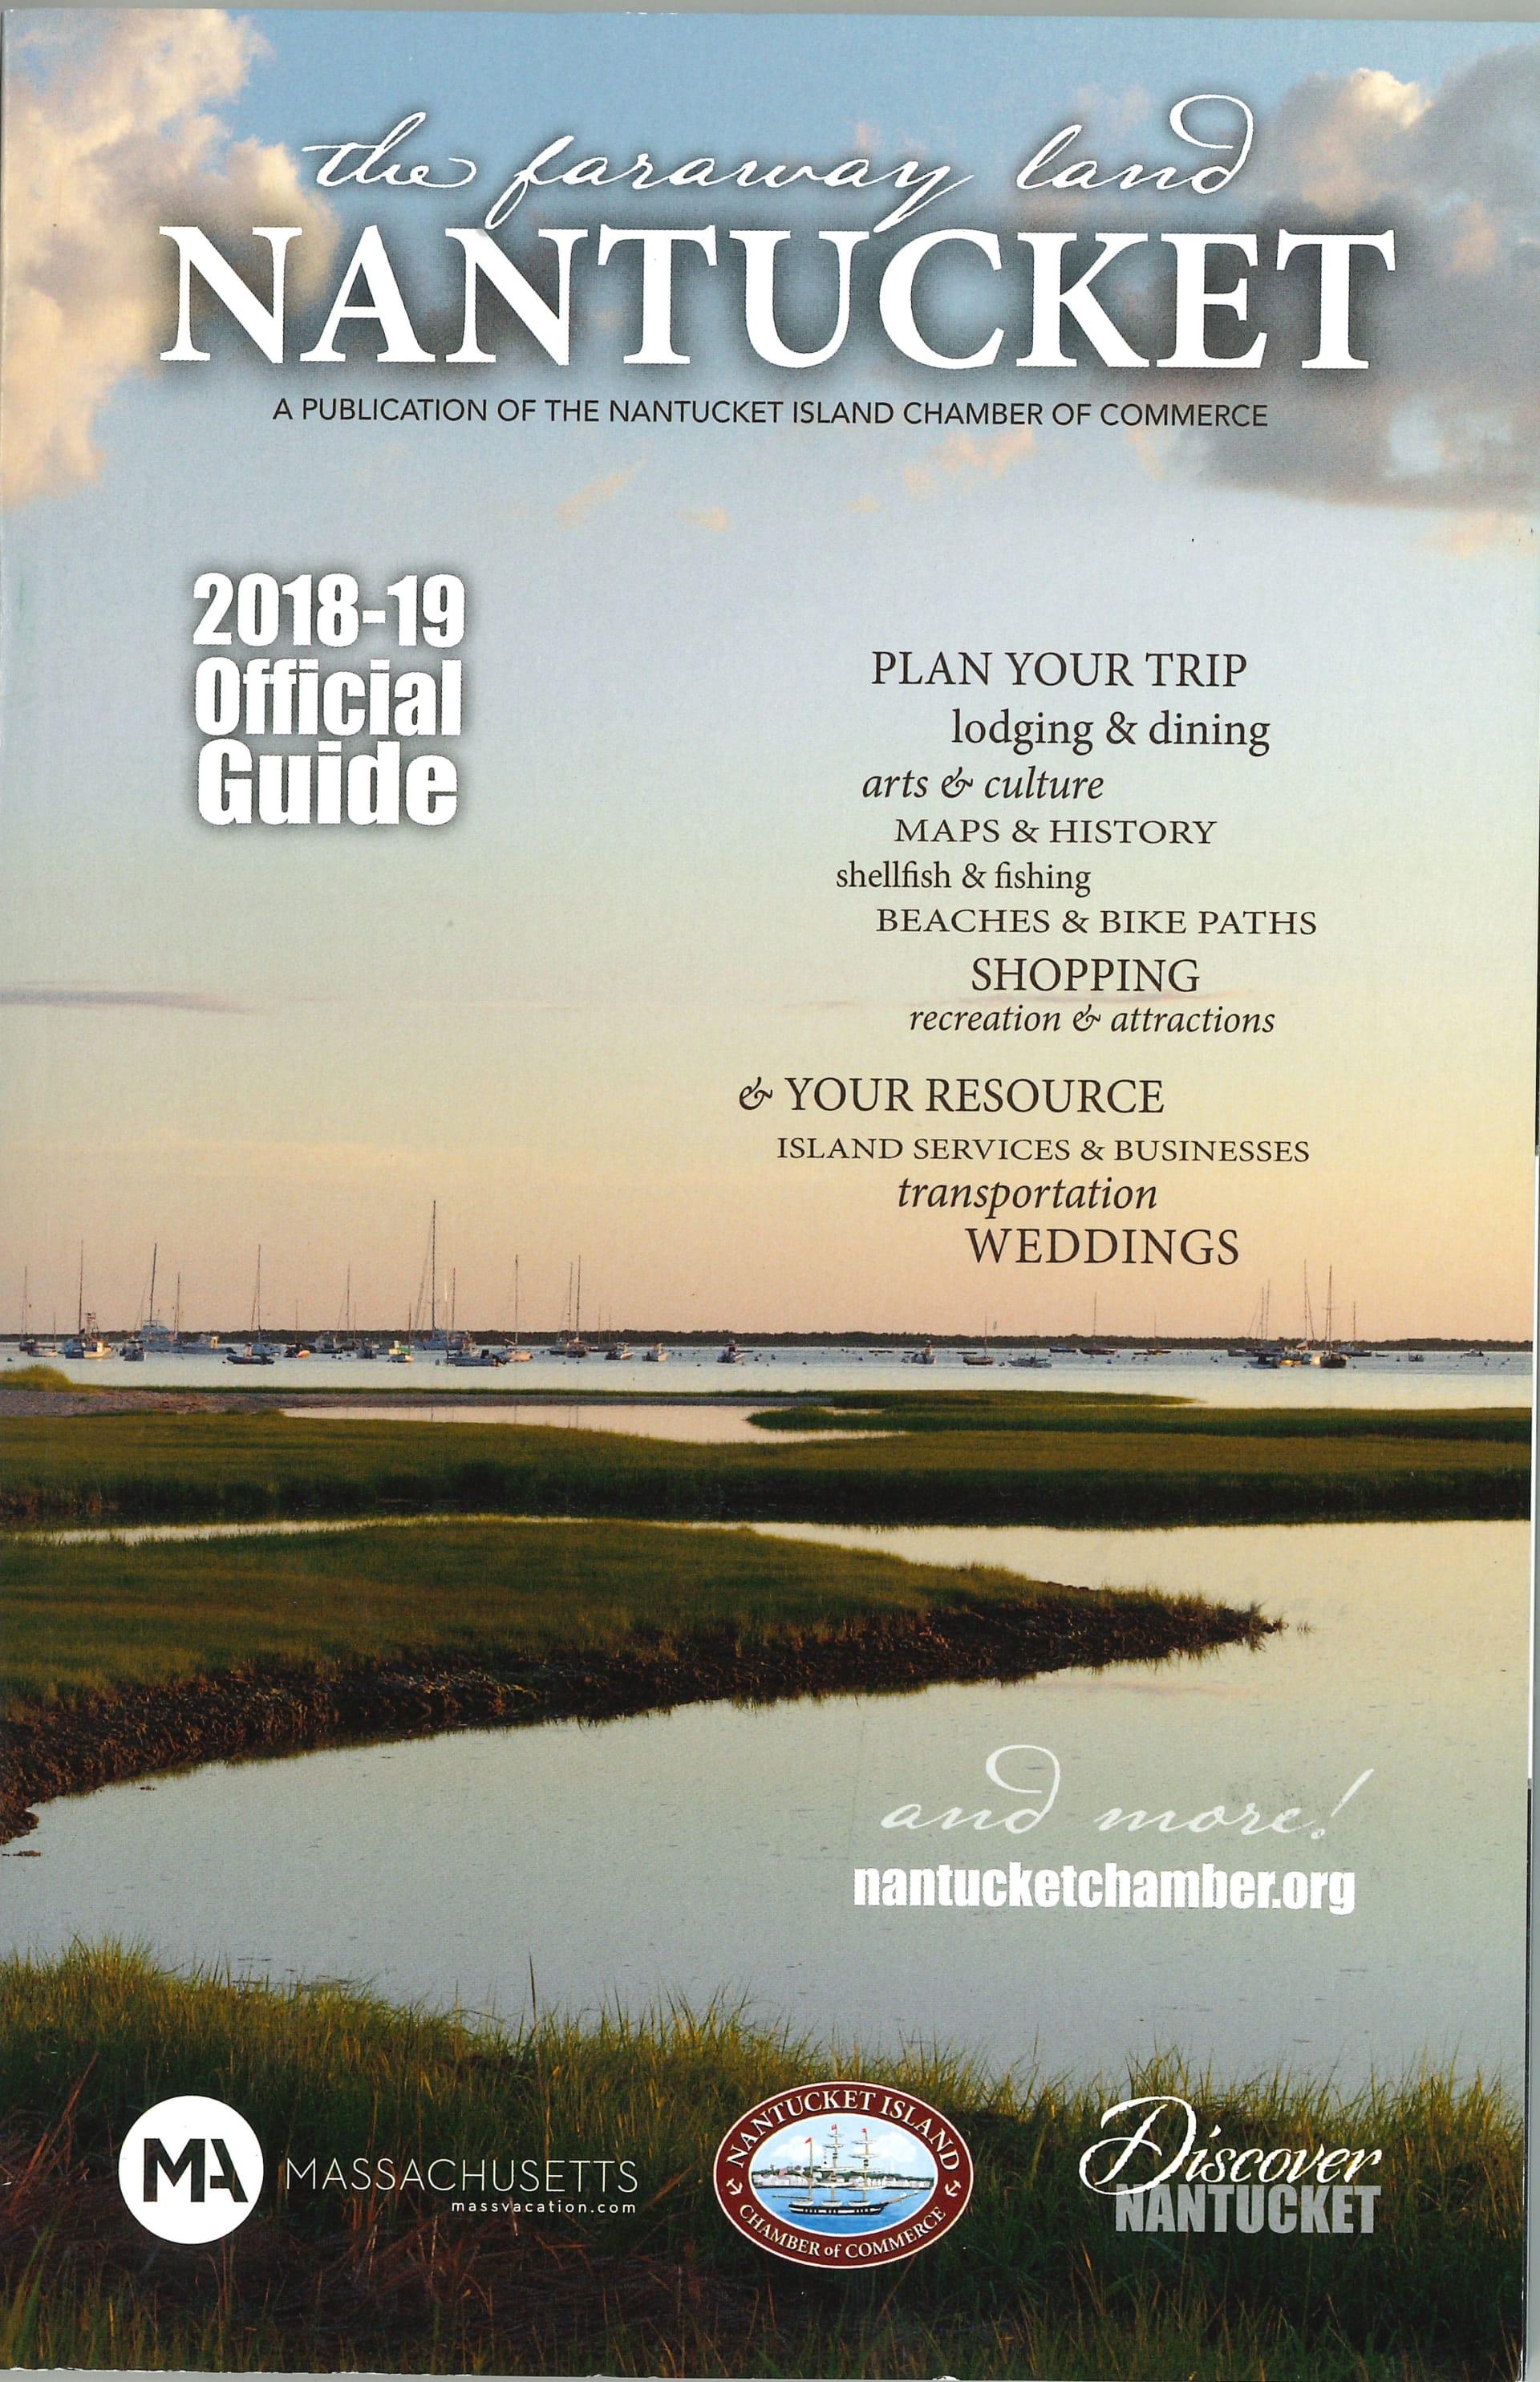 2018-19 Nantucket Guidebook